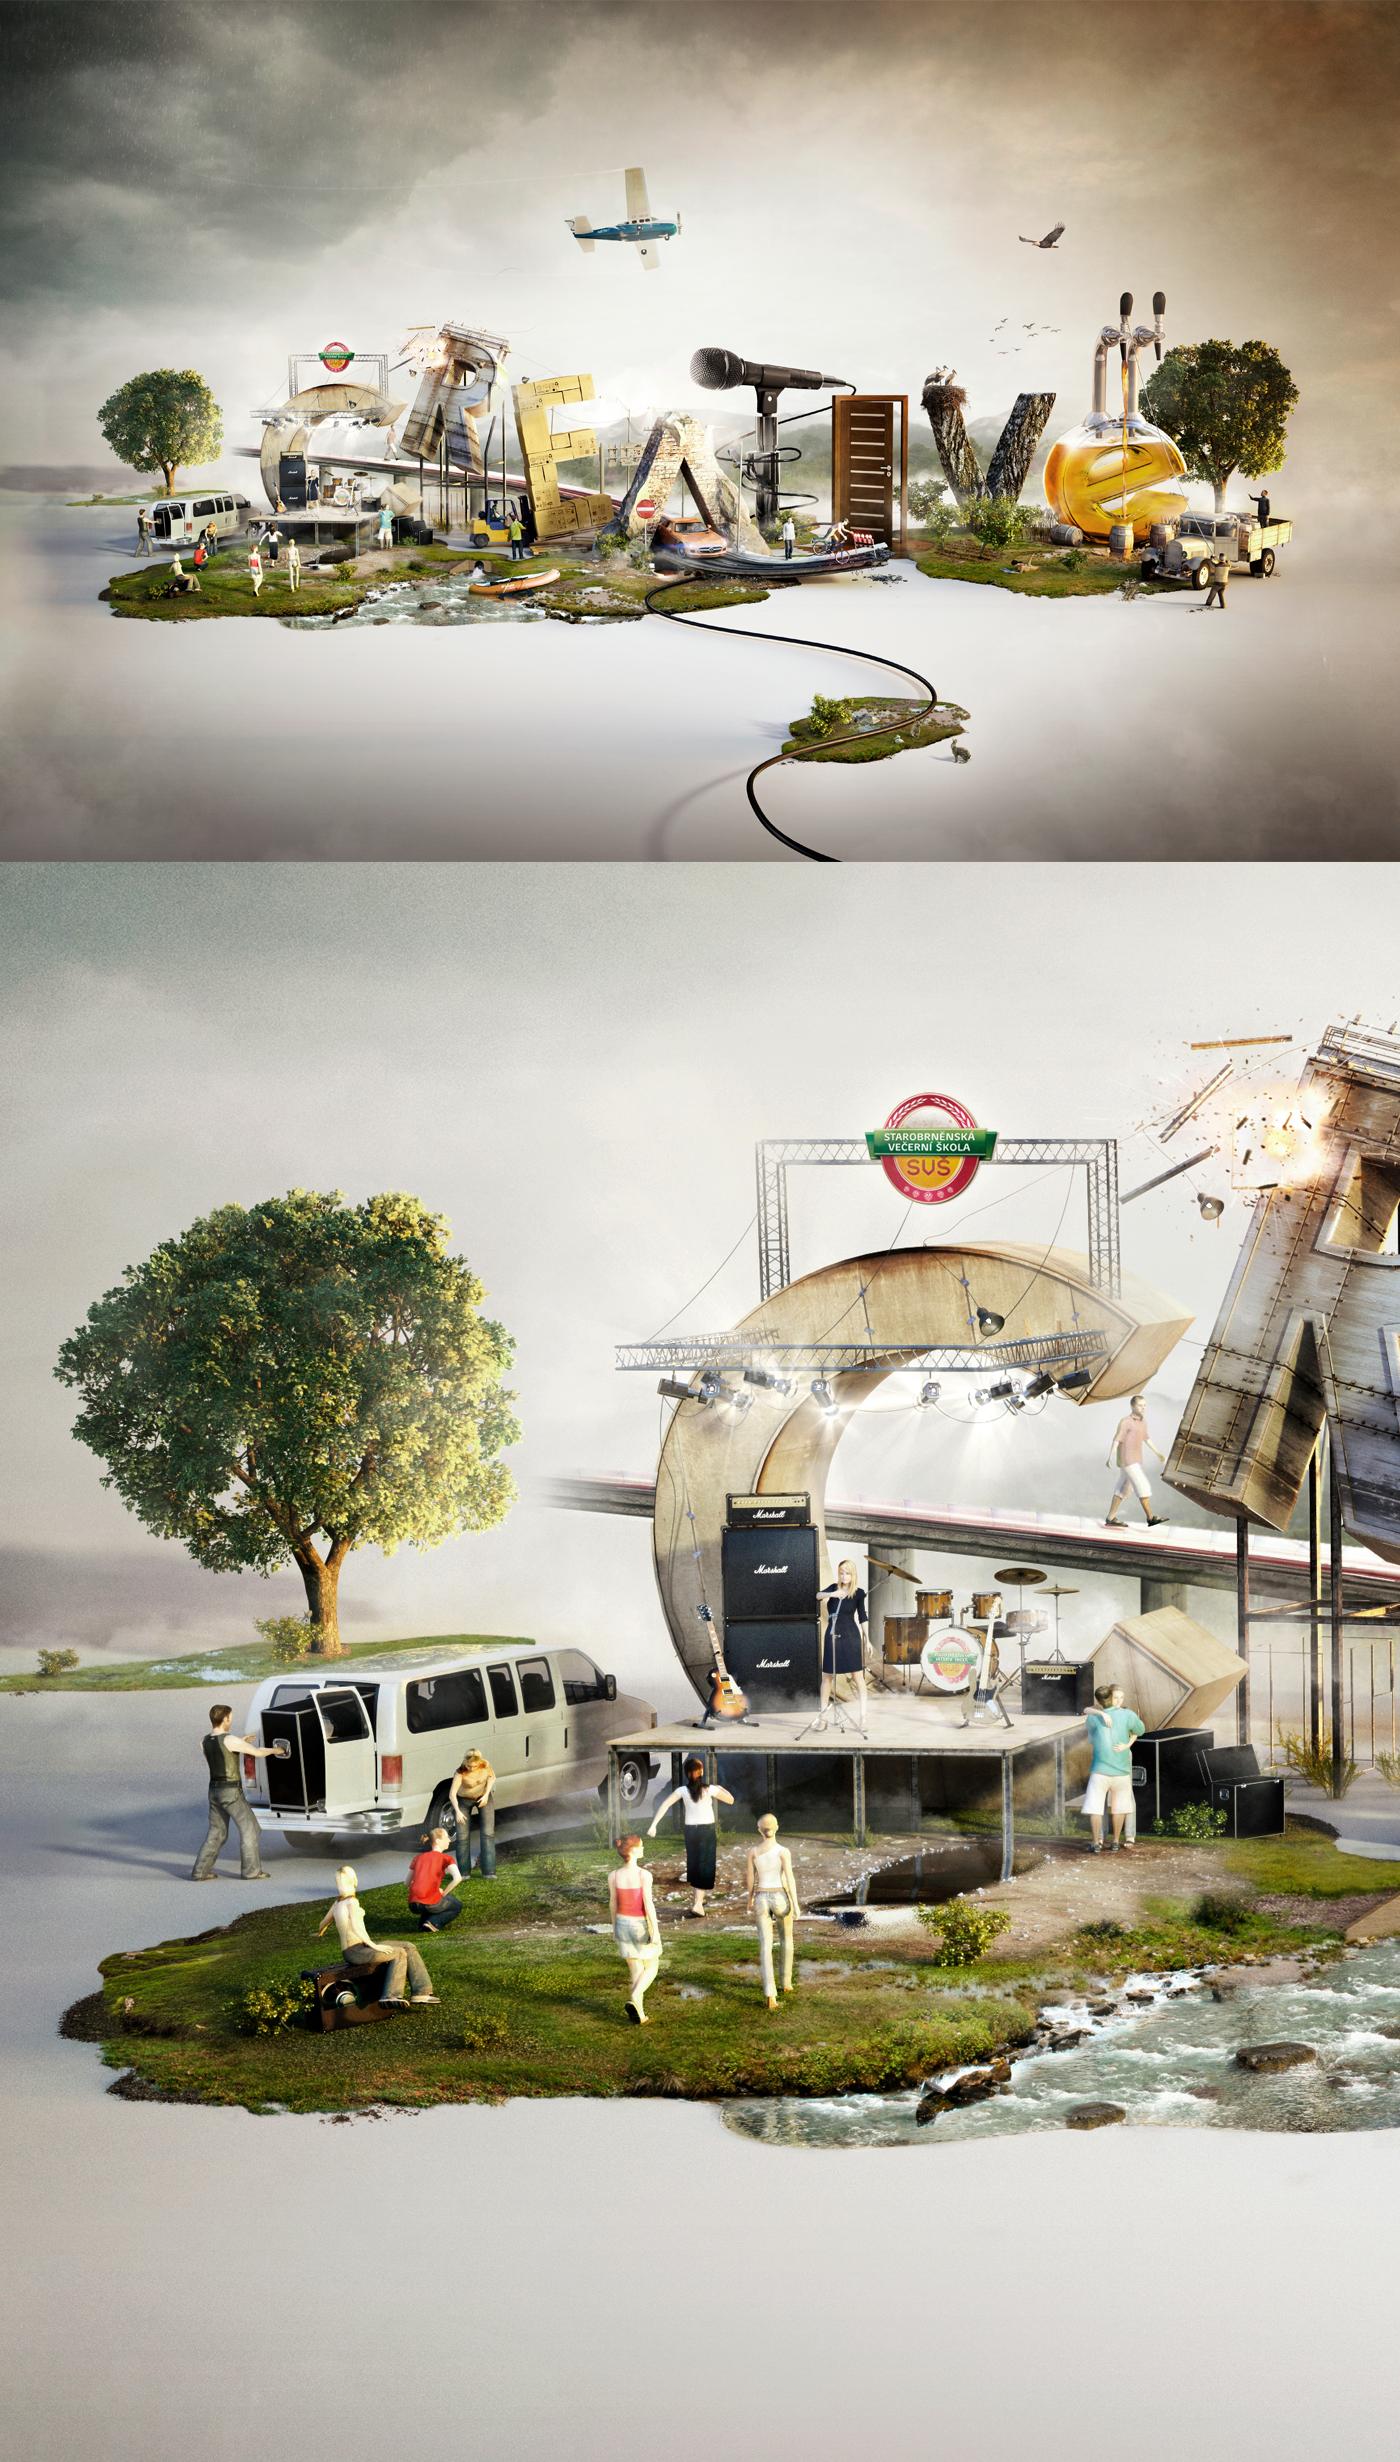 Creative miniworld